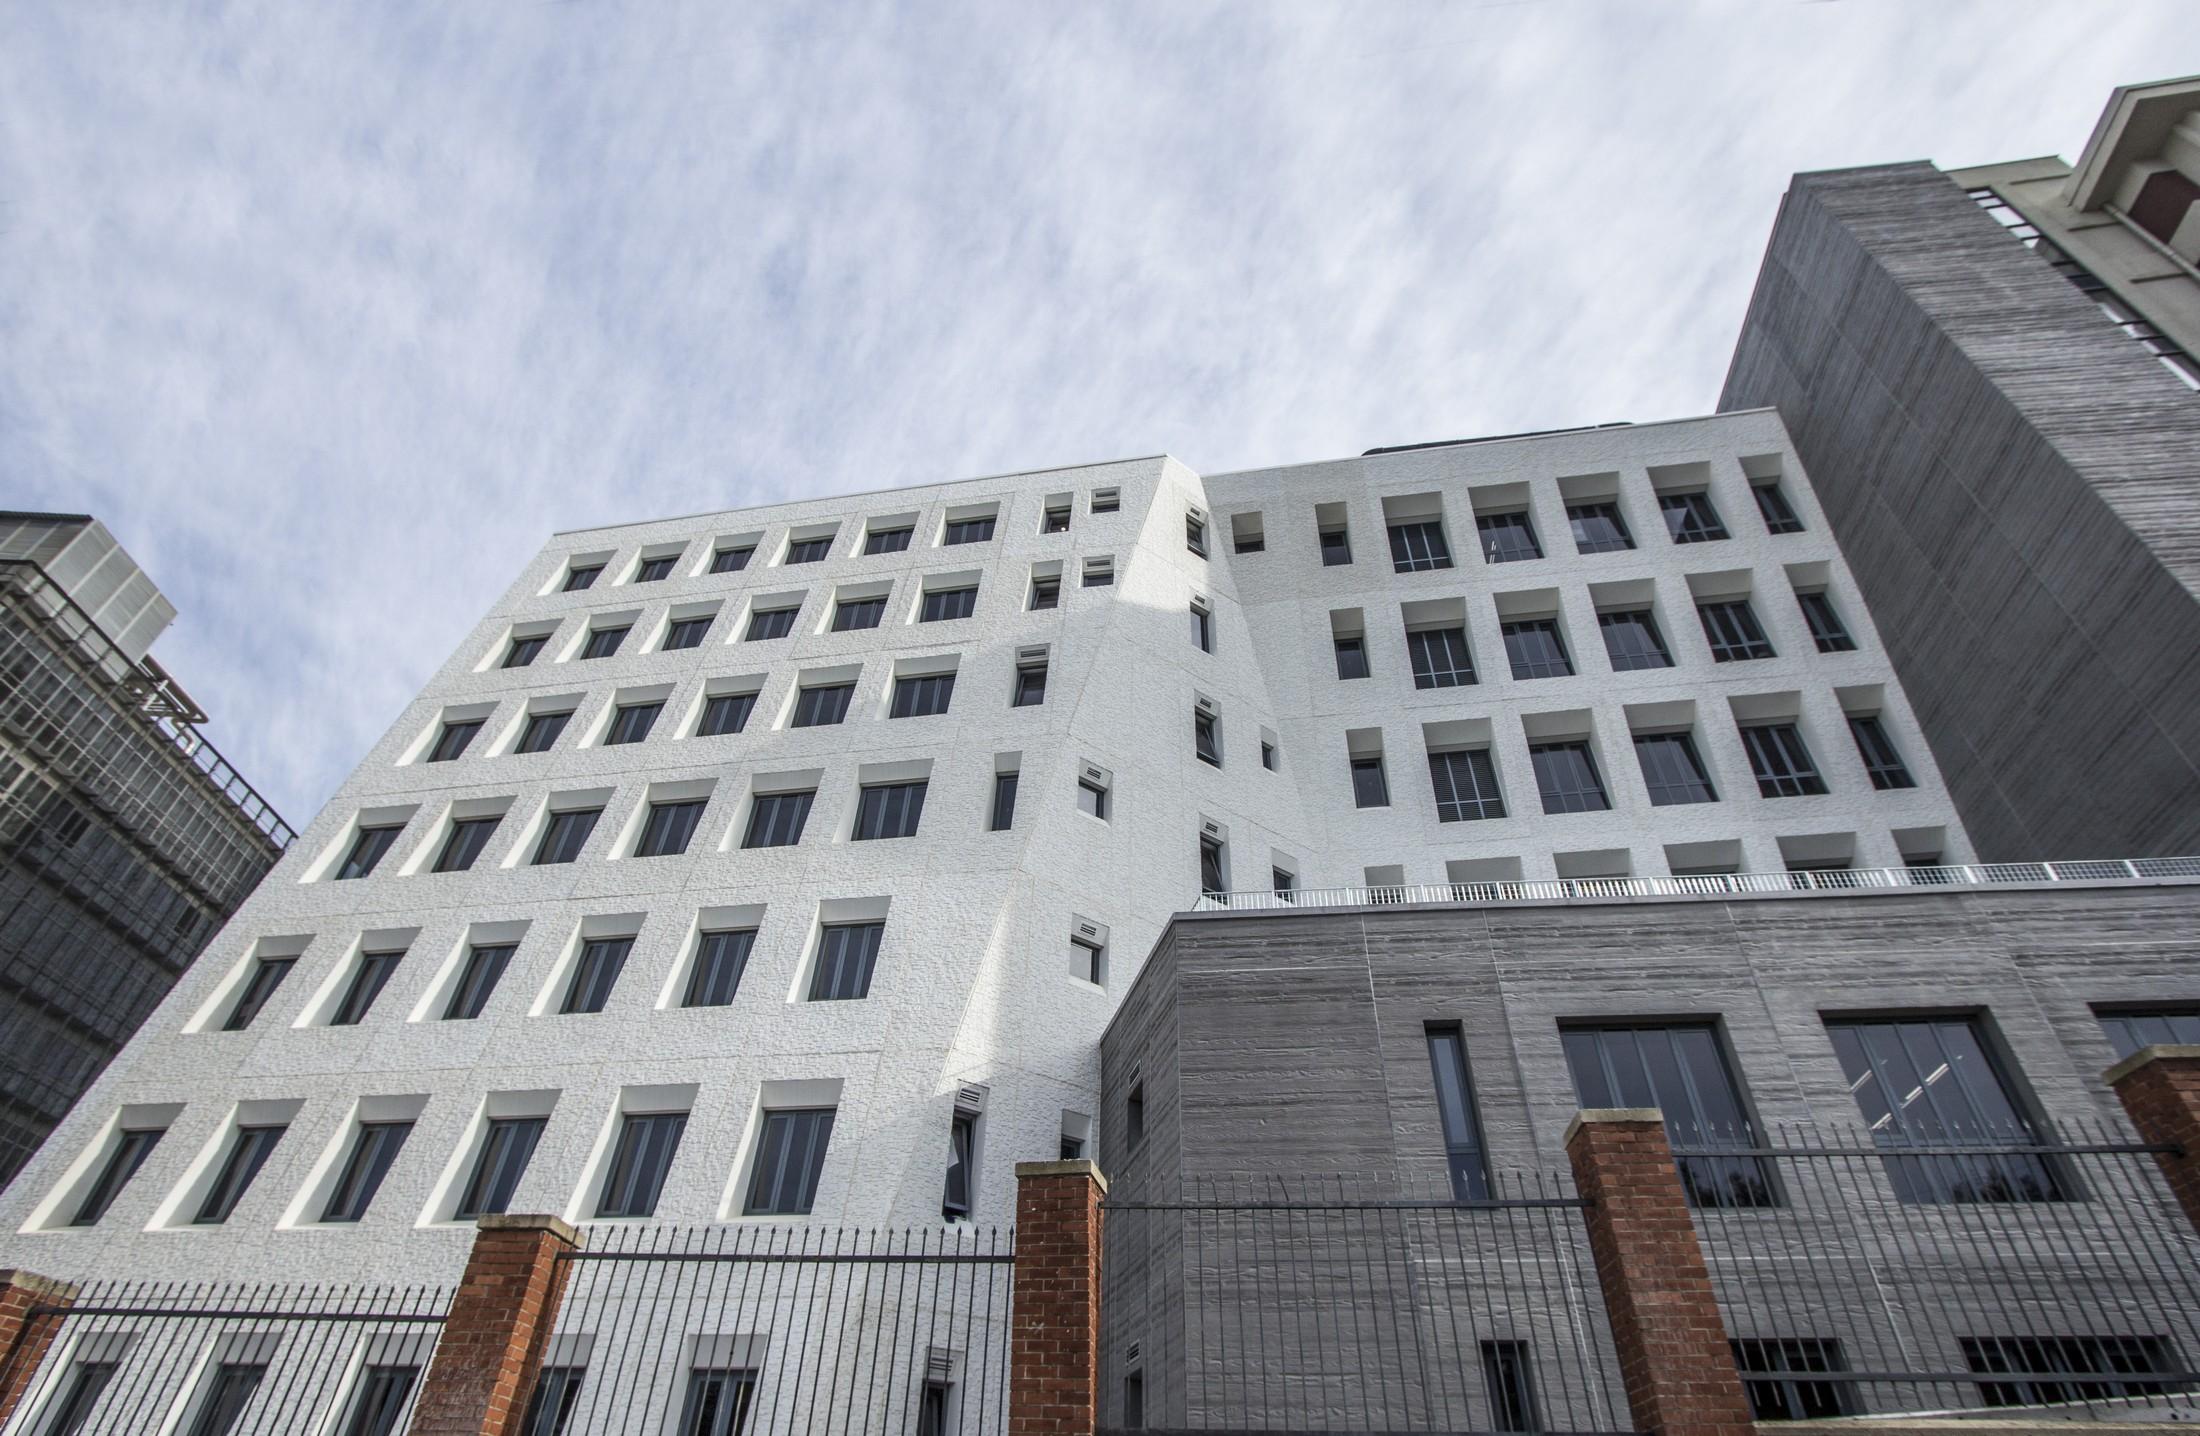 Audb architecture and urban design bureau archello